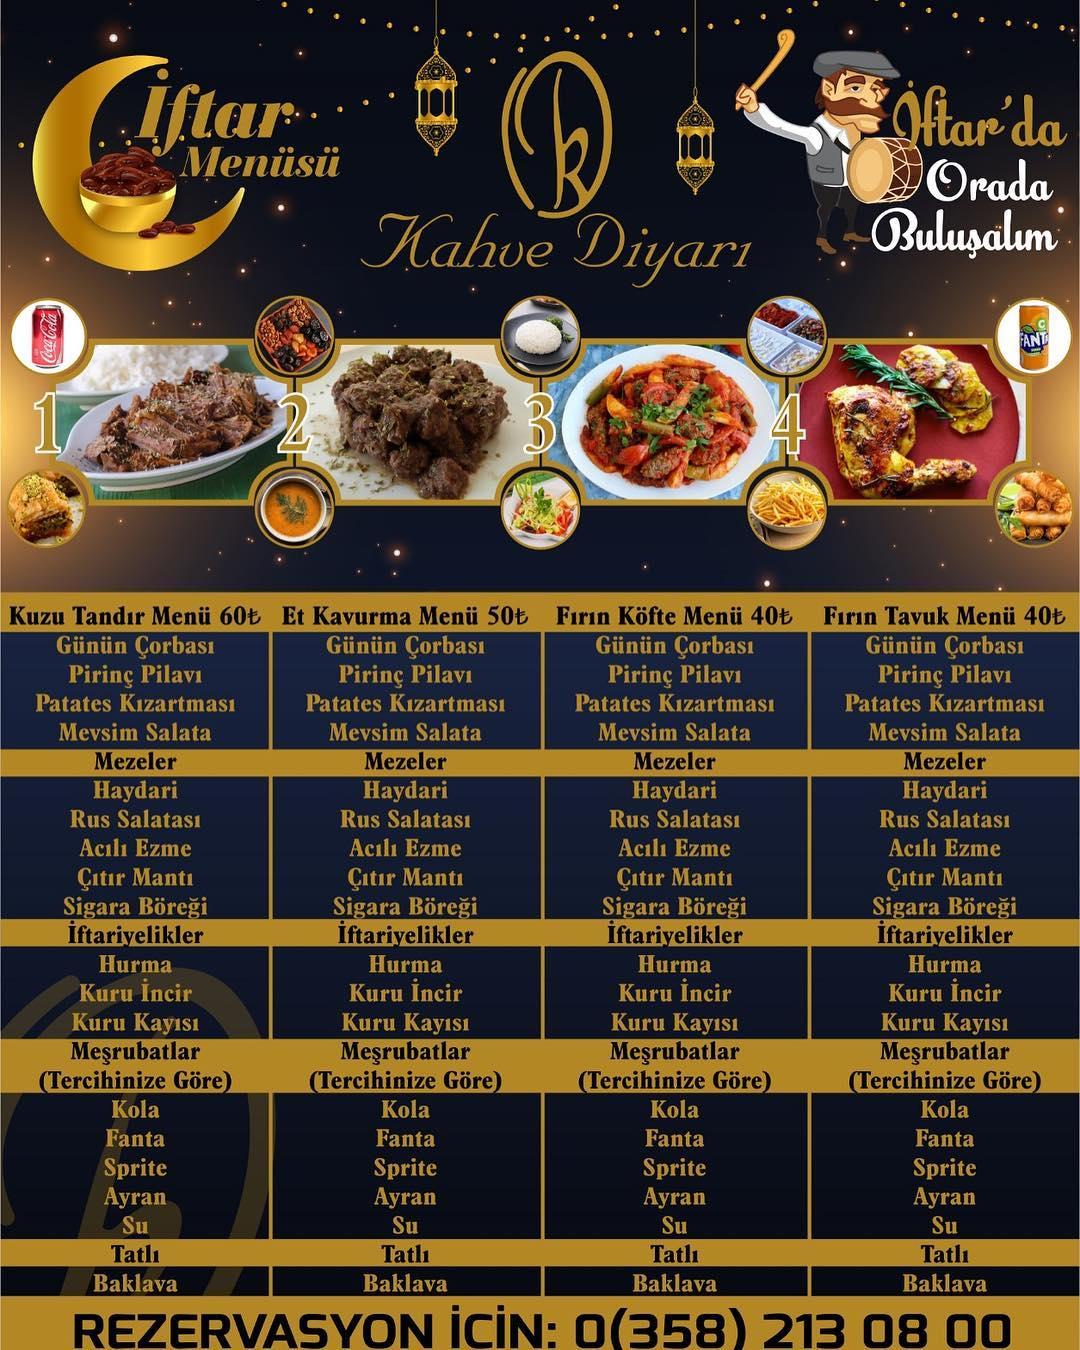 amasya iftar menüsü amasya iftar yerleri amasya iftar menü fiyatları amasya ramazan menüsü